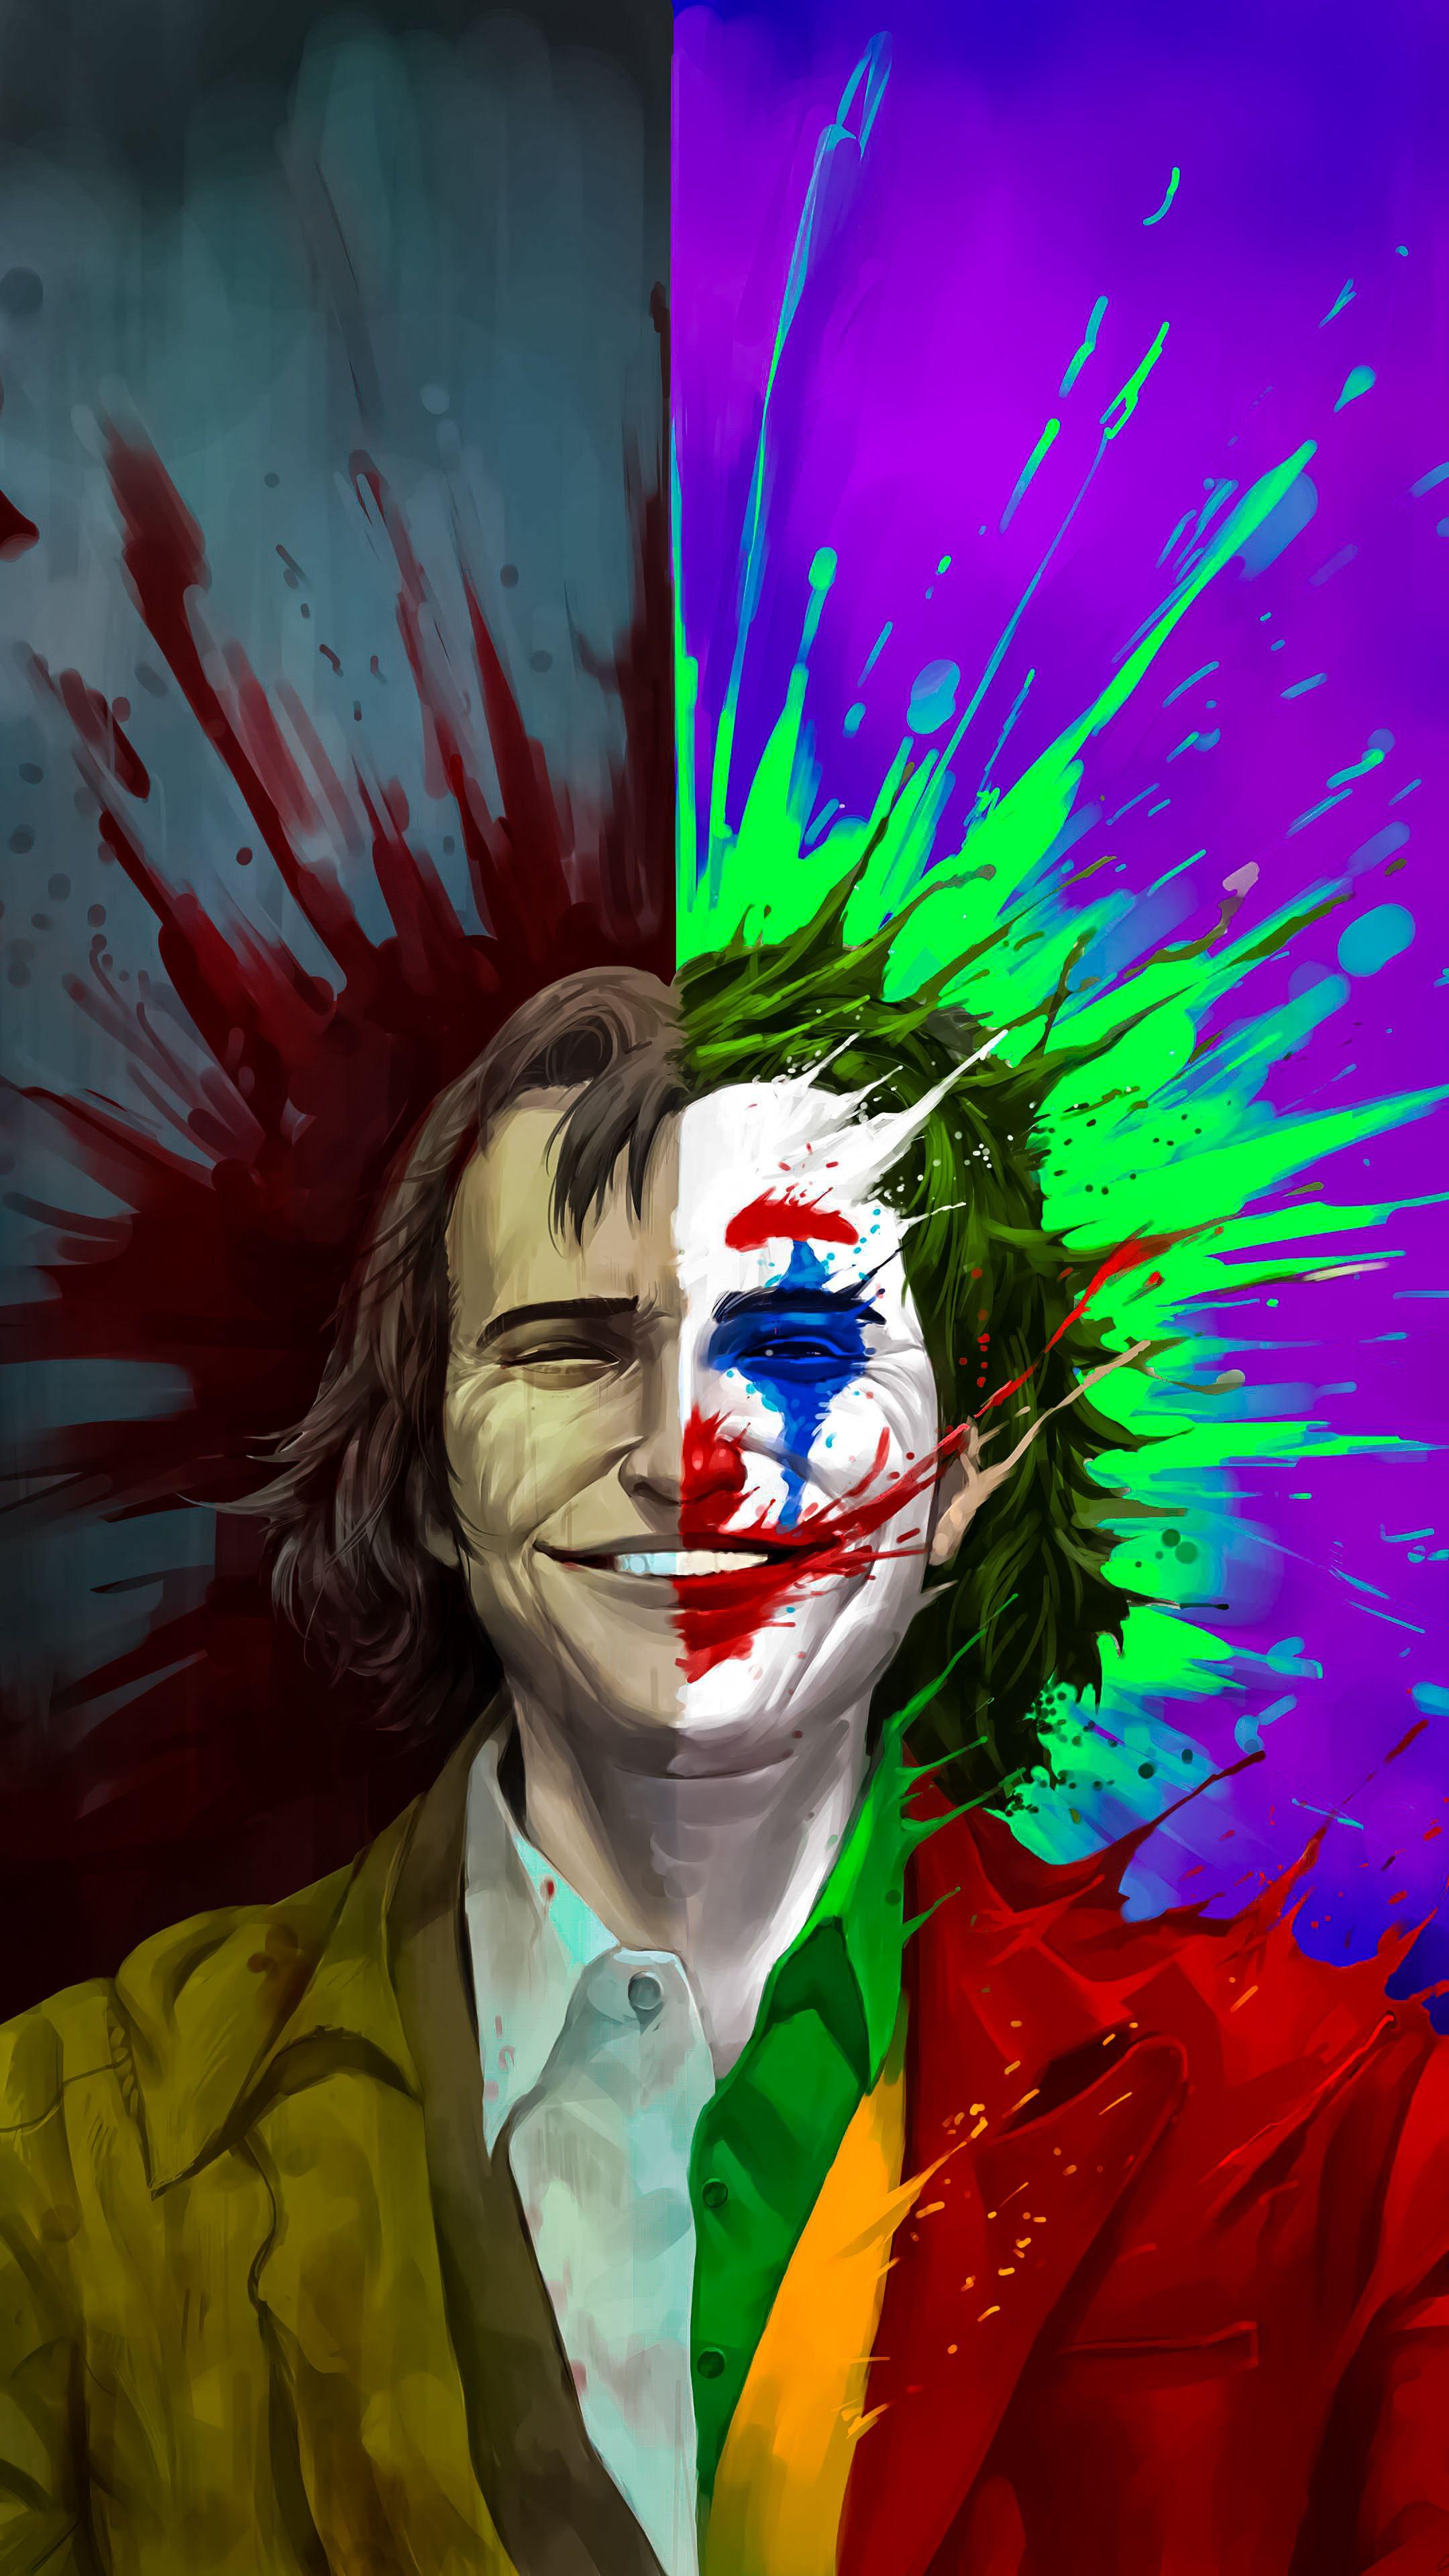 Pin By Reza Es On عکس های هنری In 2020 Joker Smile Joker Iphone Wallpaper Joker Poster